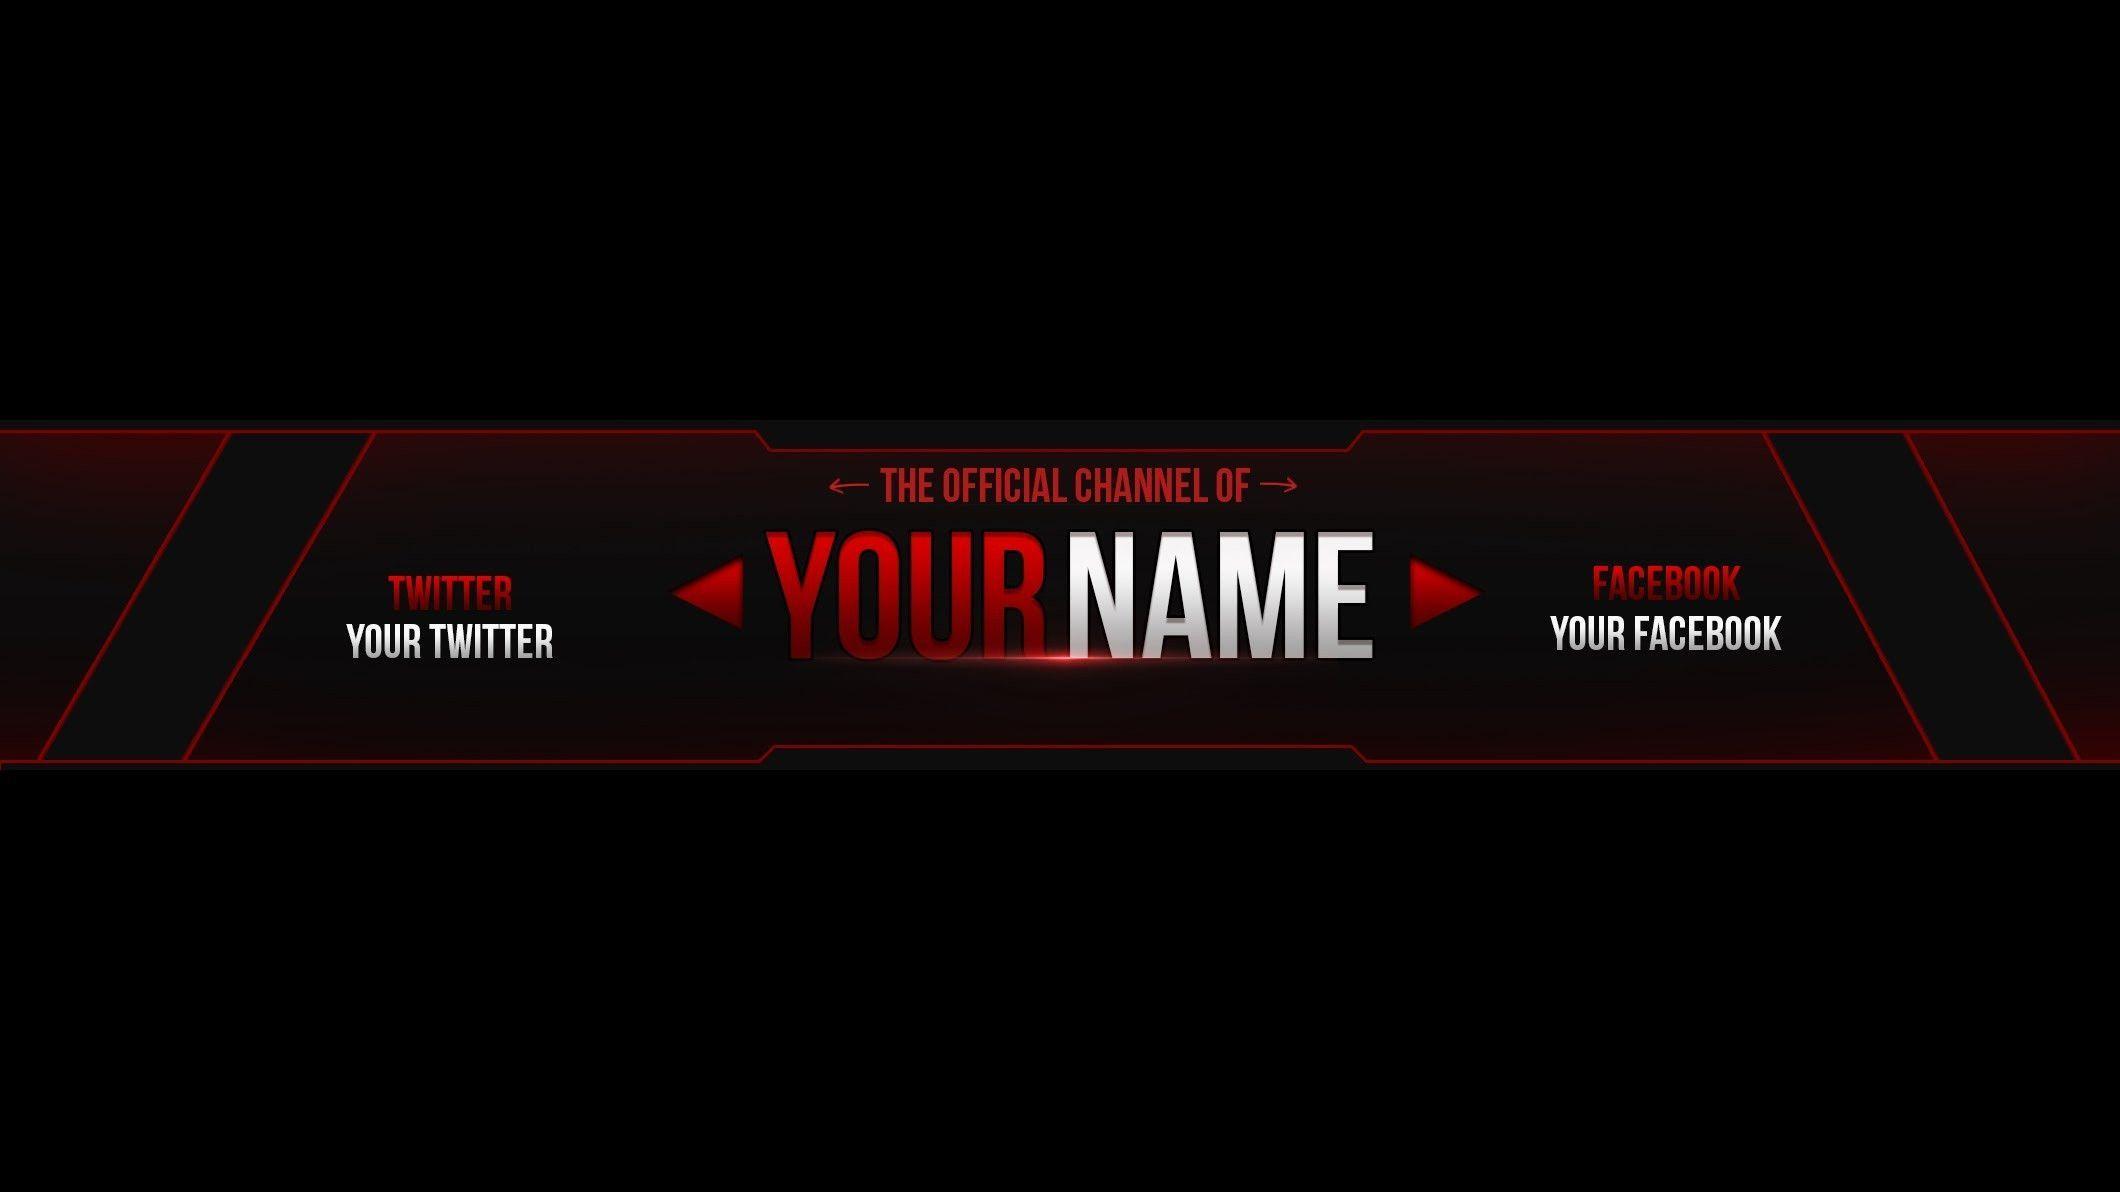 Nba Banner Template New Inspirational Make Your Youtube Throughout Yt Banner Template Youtube Banner Template Youtube Banner Design Youtube Banner Backgrounds